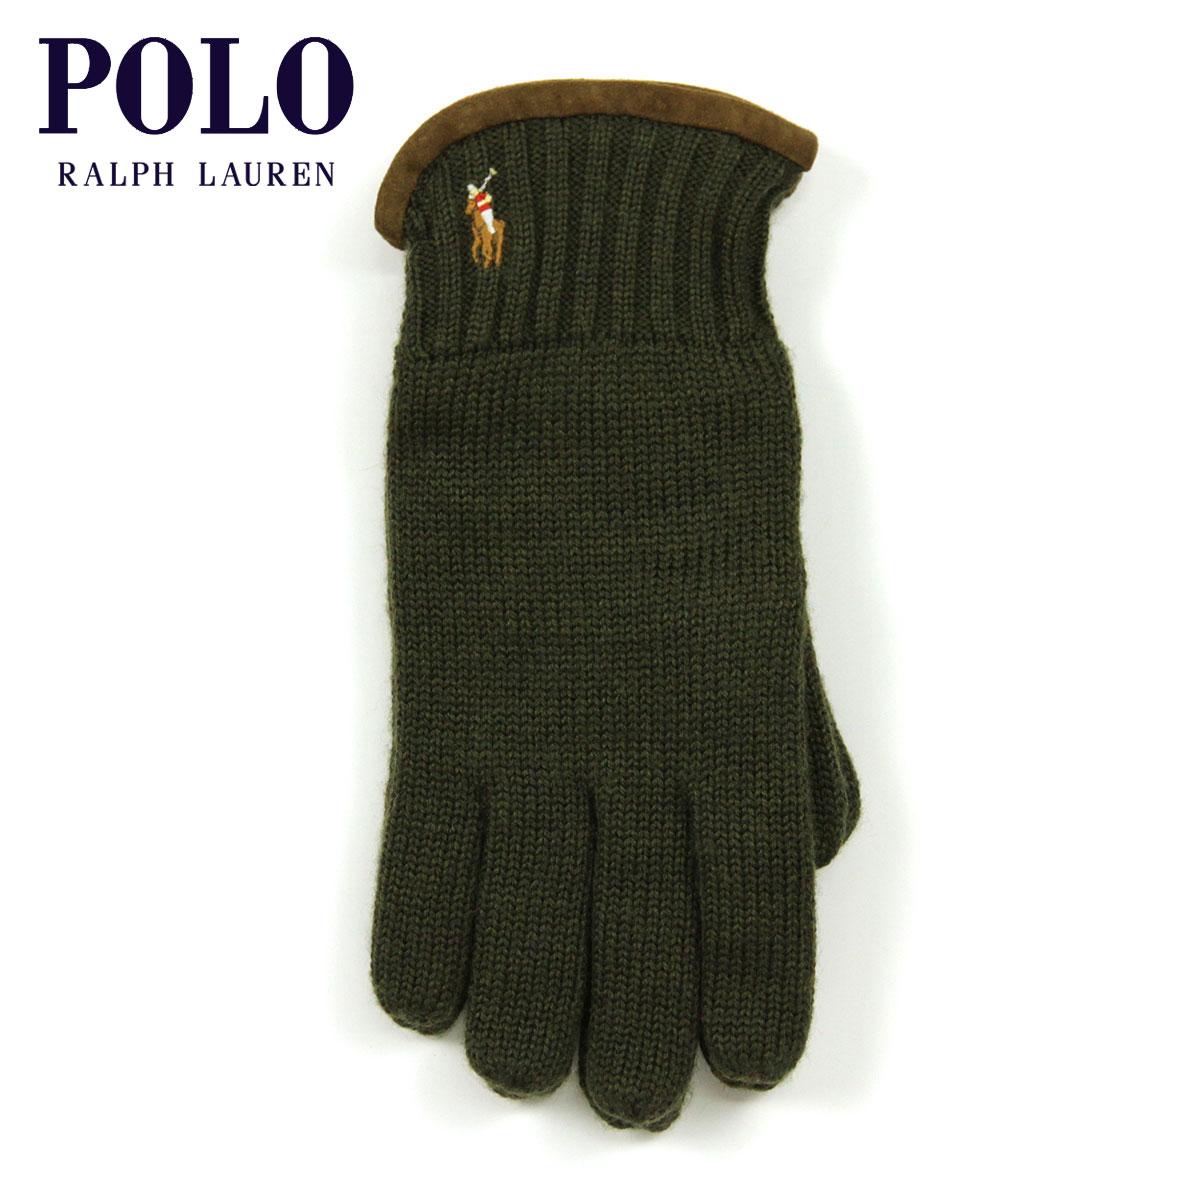 30%OFFセール 【販売期間 4/22 09:00〜4/26 09:59】 ポロ ラルフローレン POLO RALPH LAUREN 正規品 手袋 Classic Merino Gloves OLIVE D20S30